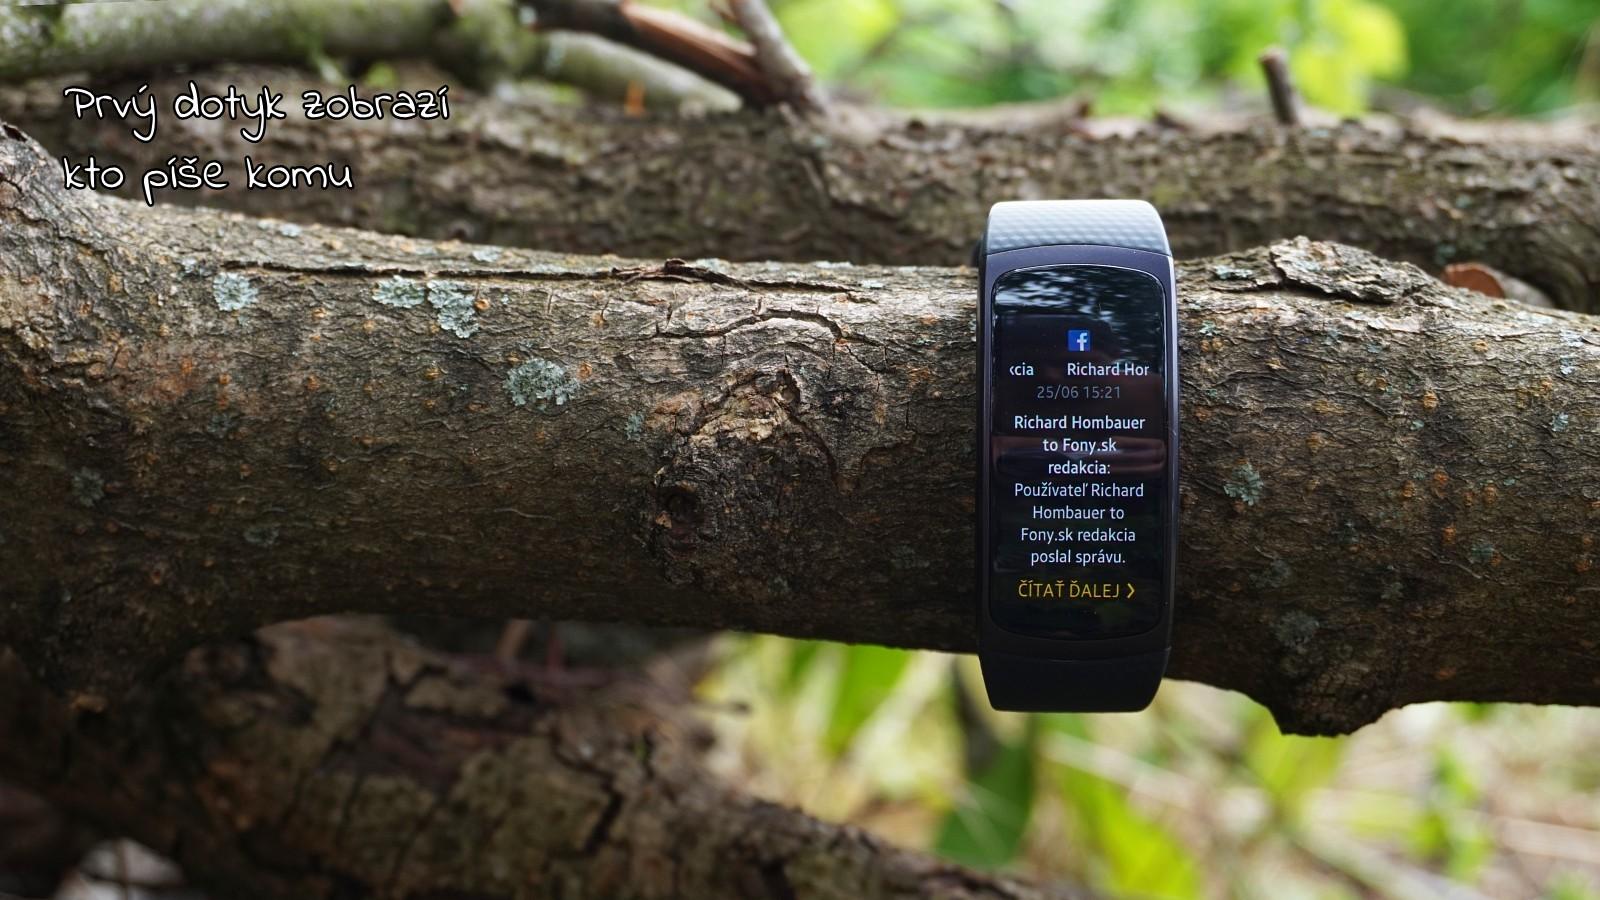 3de36ffd7 Samsung Gear Fit 2 - sparing partner na celý deň Zdroj: www.fony.sk